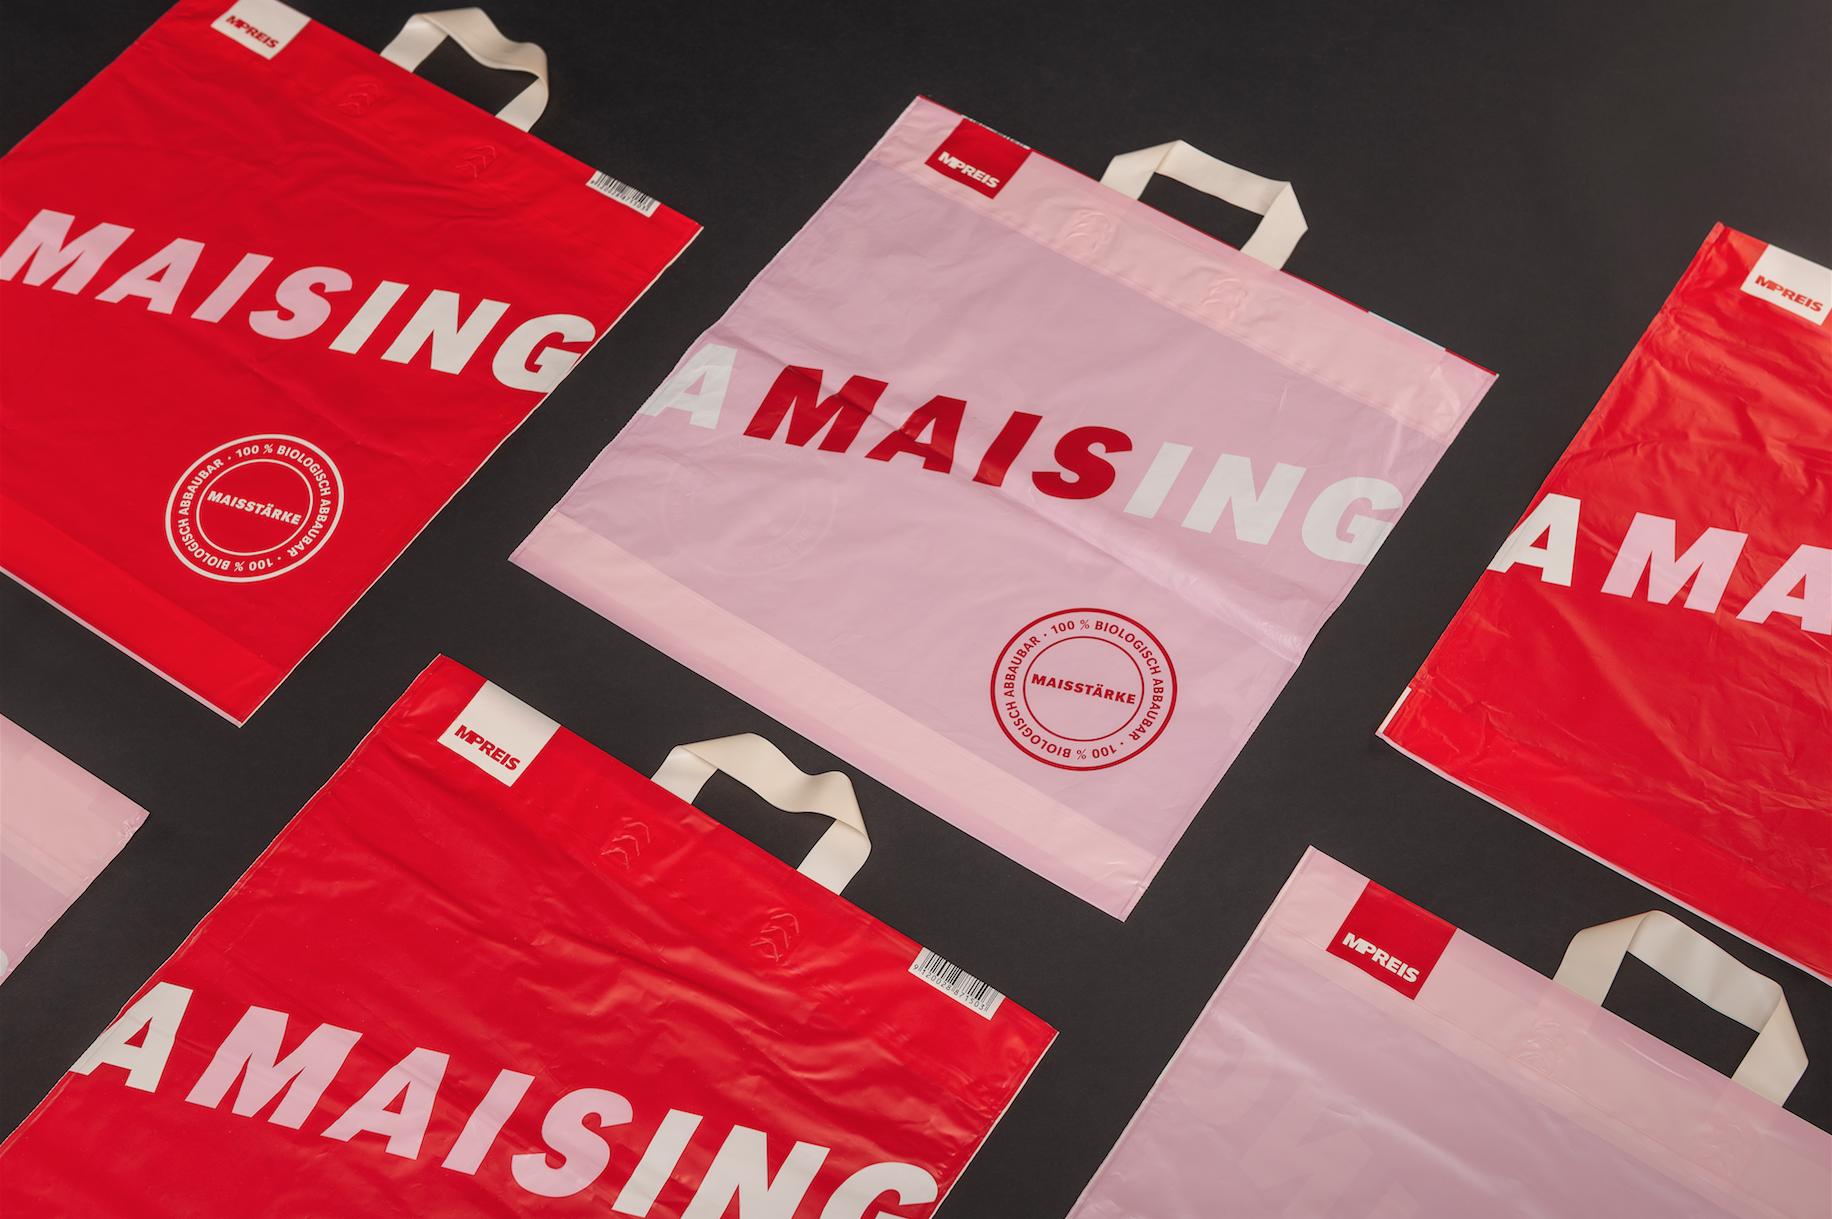 AMAISING Bag